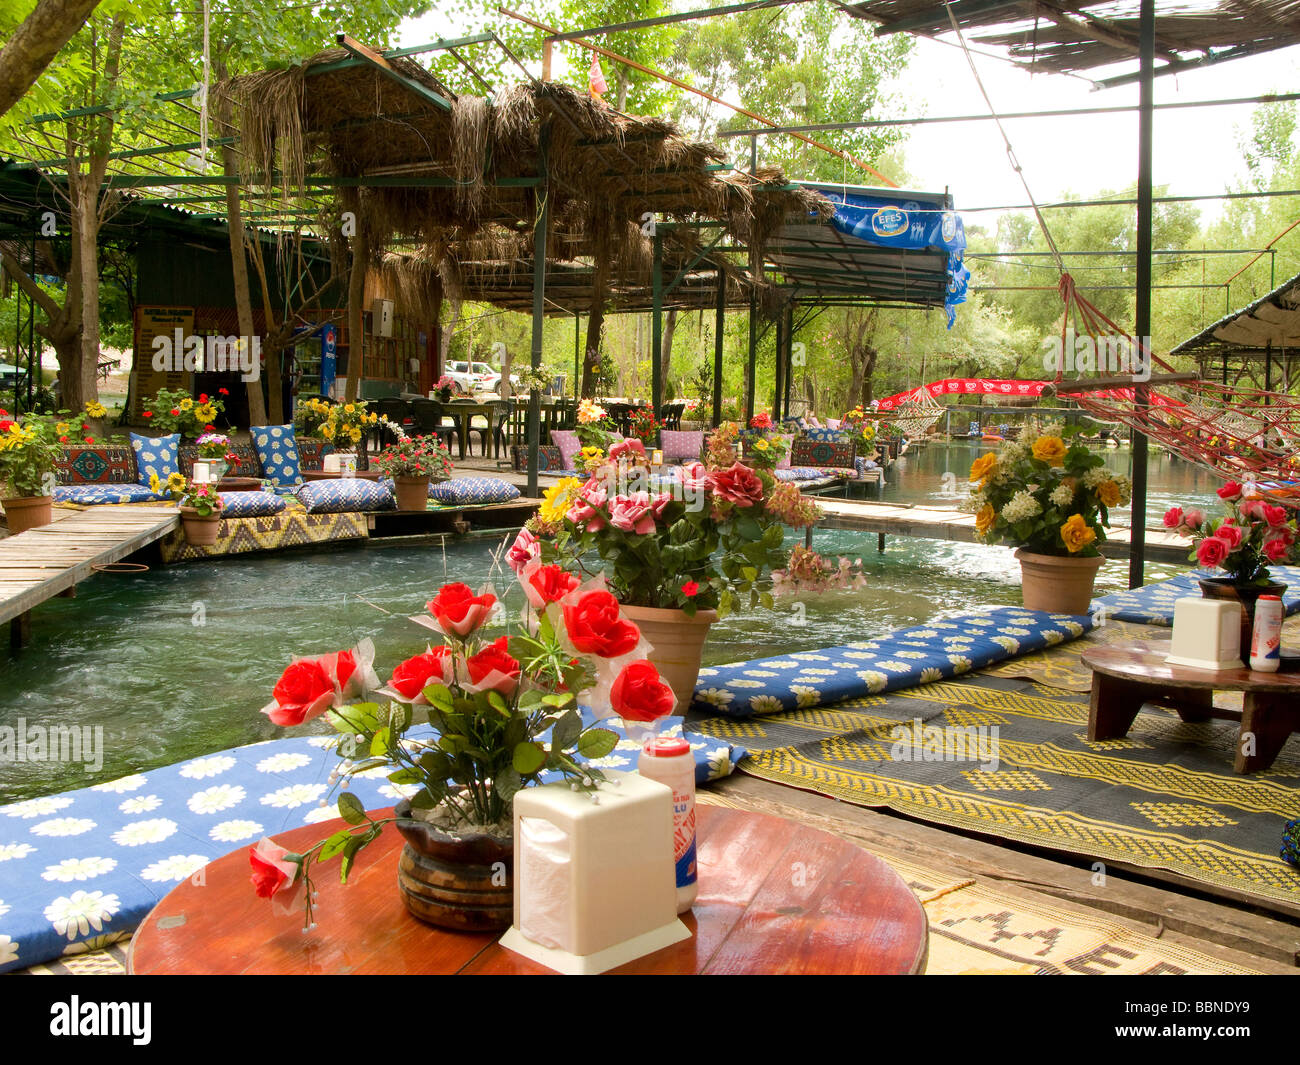 Yakapark Cafe Restaurant Near The Saklikent Gorge